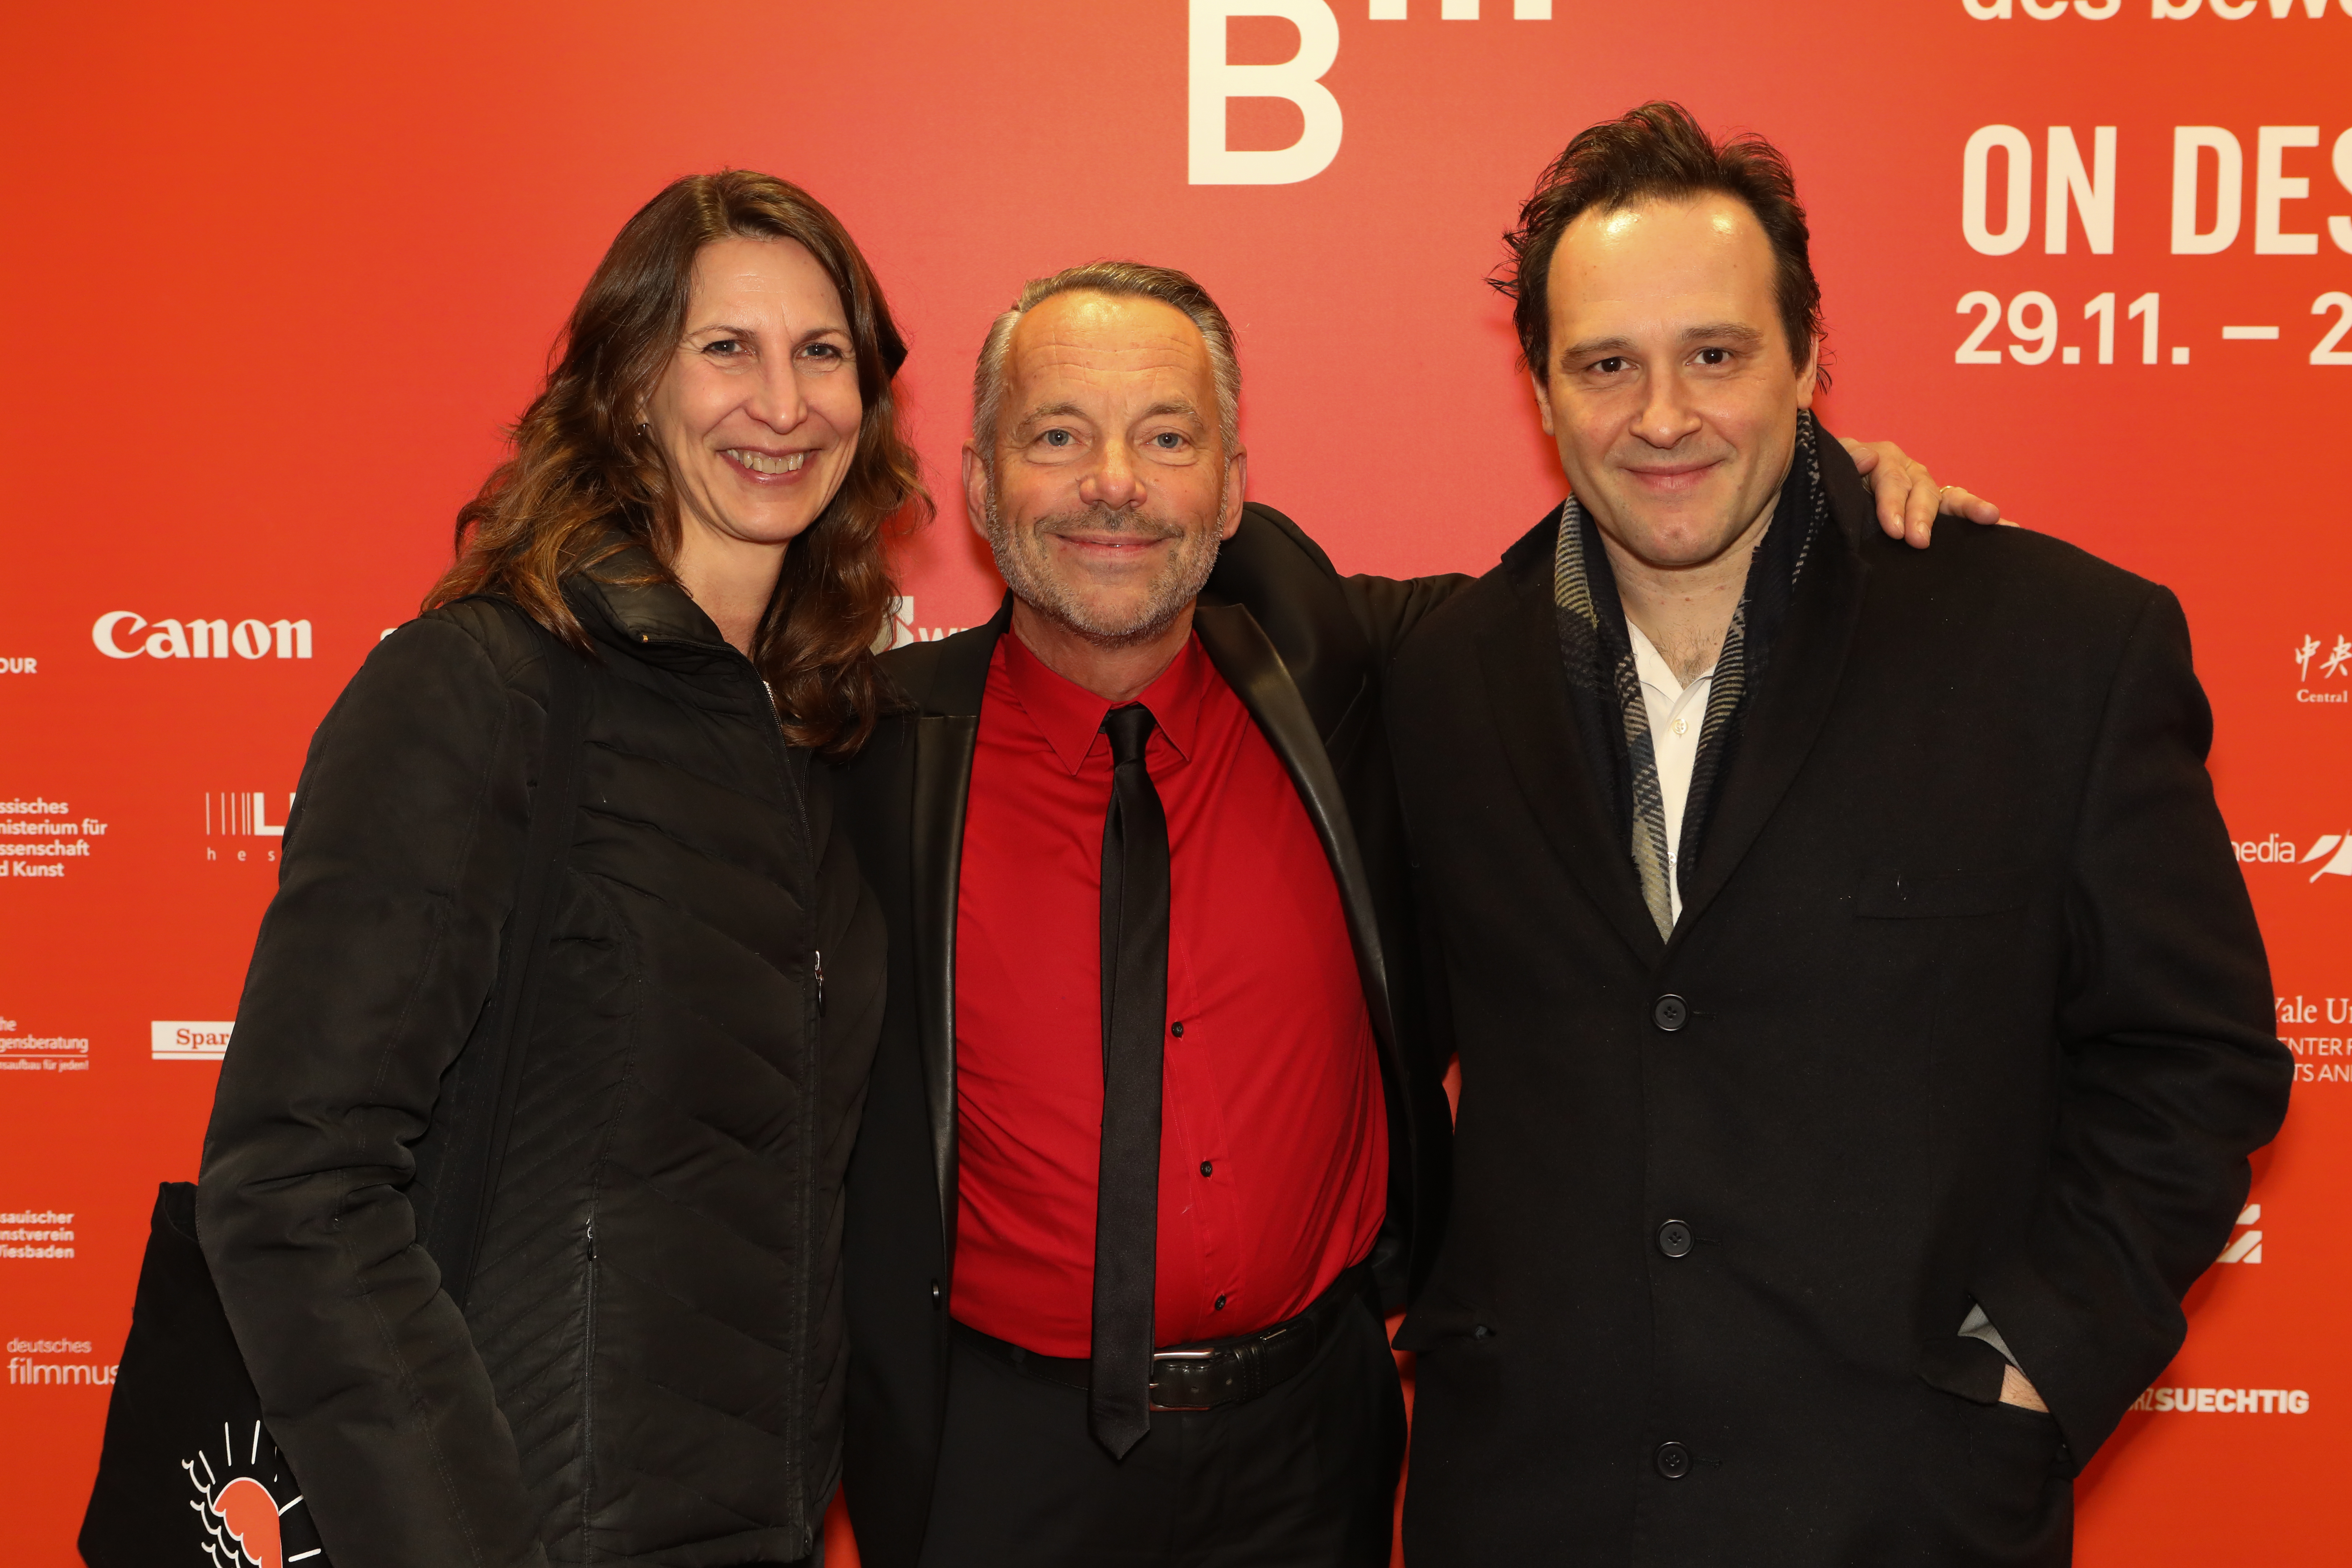 Roter Teppich B3 Biennale